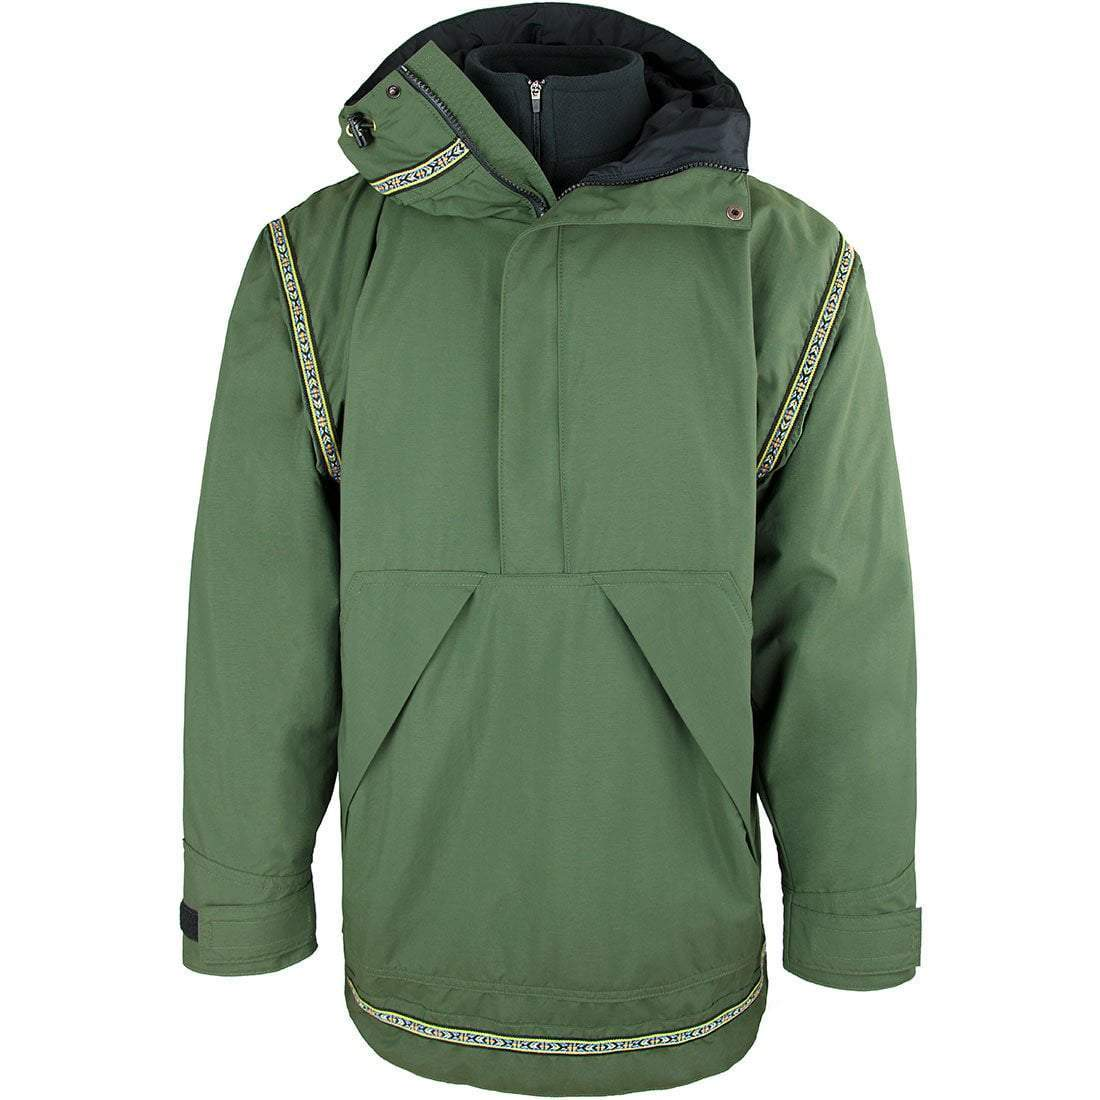 wintergreen-northern-wear-anorak-small-loden-green-shell-midnight-sun-trim-expedition-shell-anorak-partial-zip-unlined-men-s-13077529821261_2000x